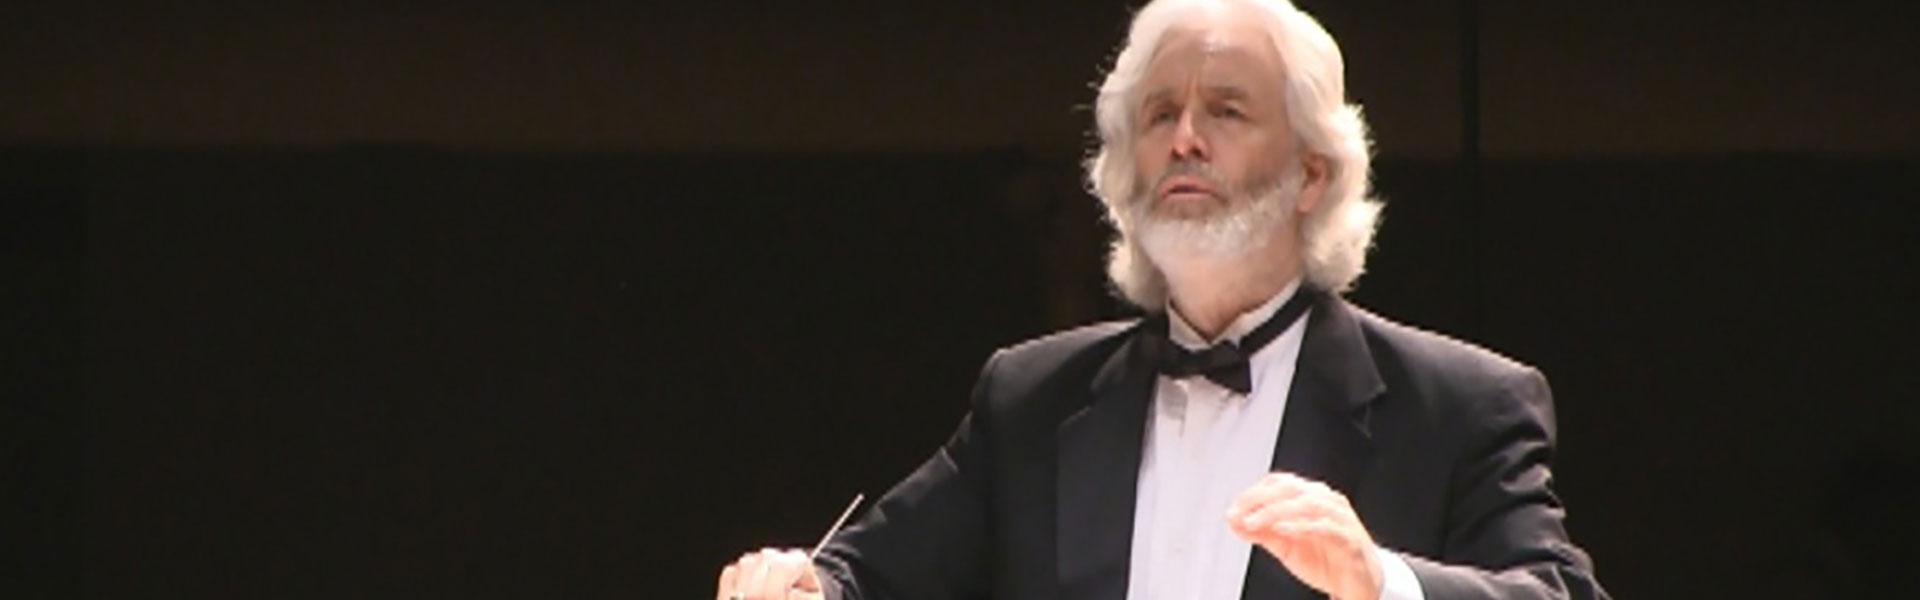 Galveston Symphony Orchestra Conductor Trond Saeverud, Galveston, TX